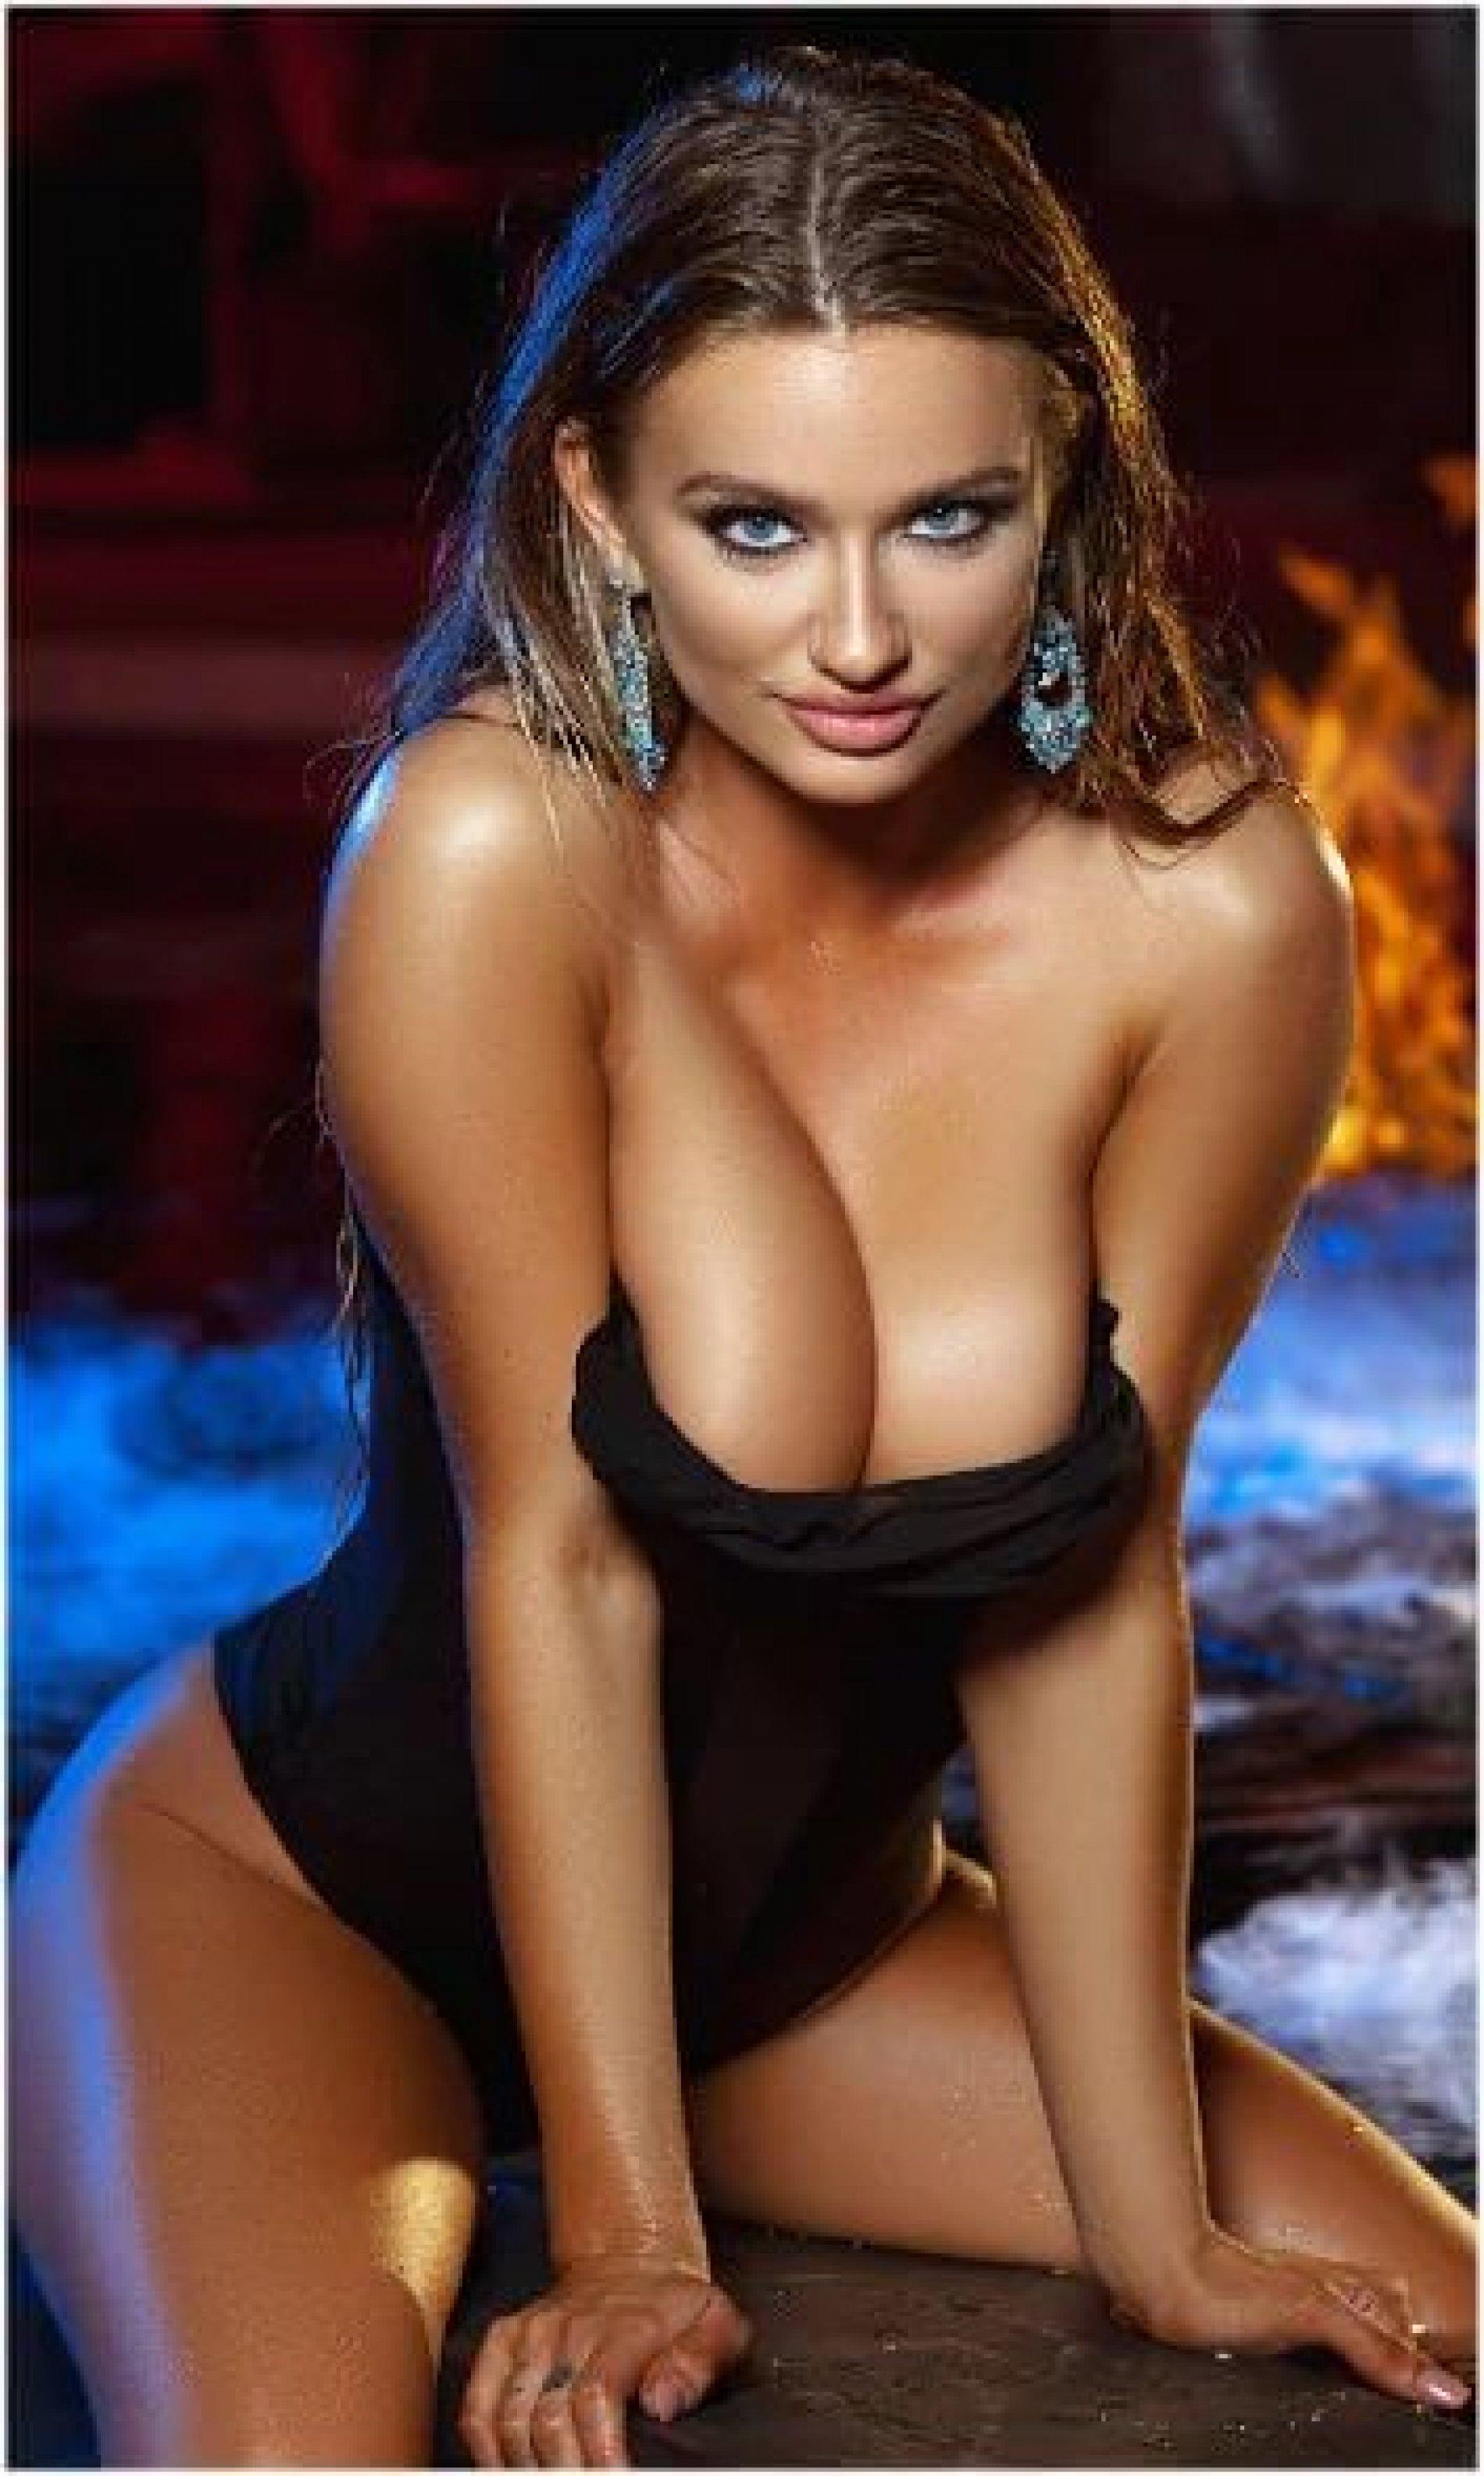 Playboy Plus' Brittney Shumaker Halloween Exclusive | Cybergirl